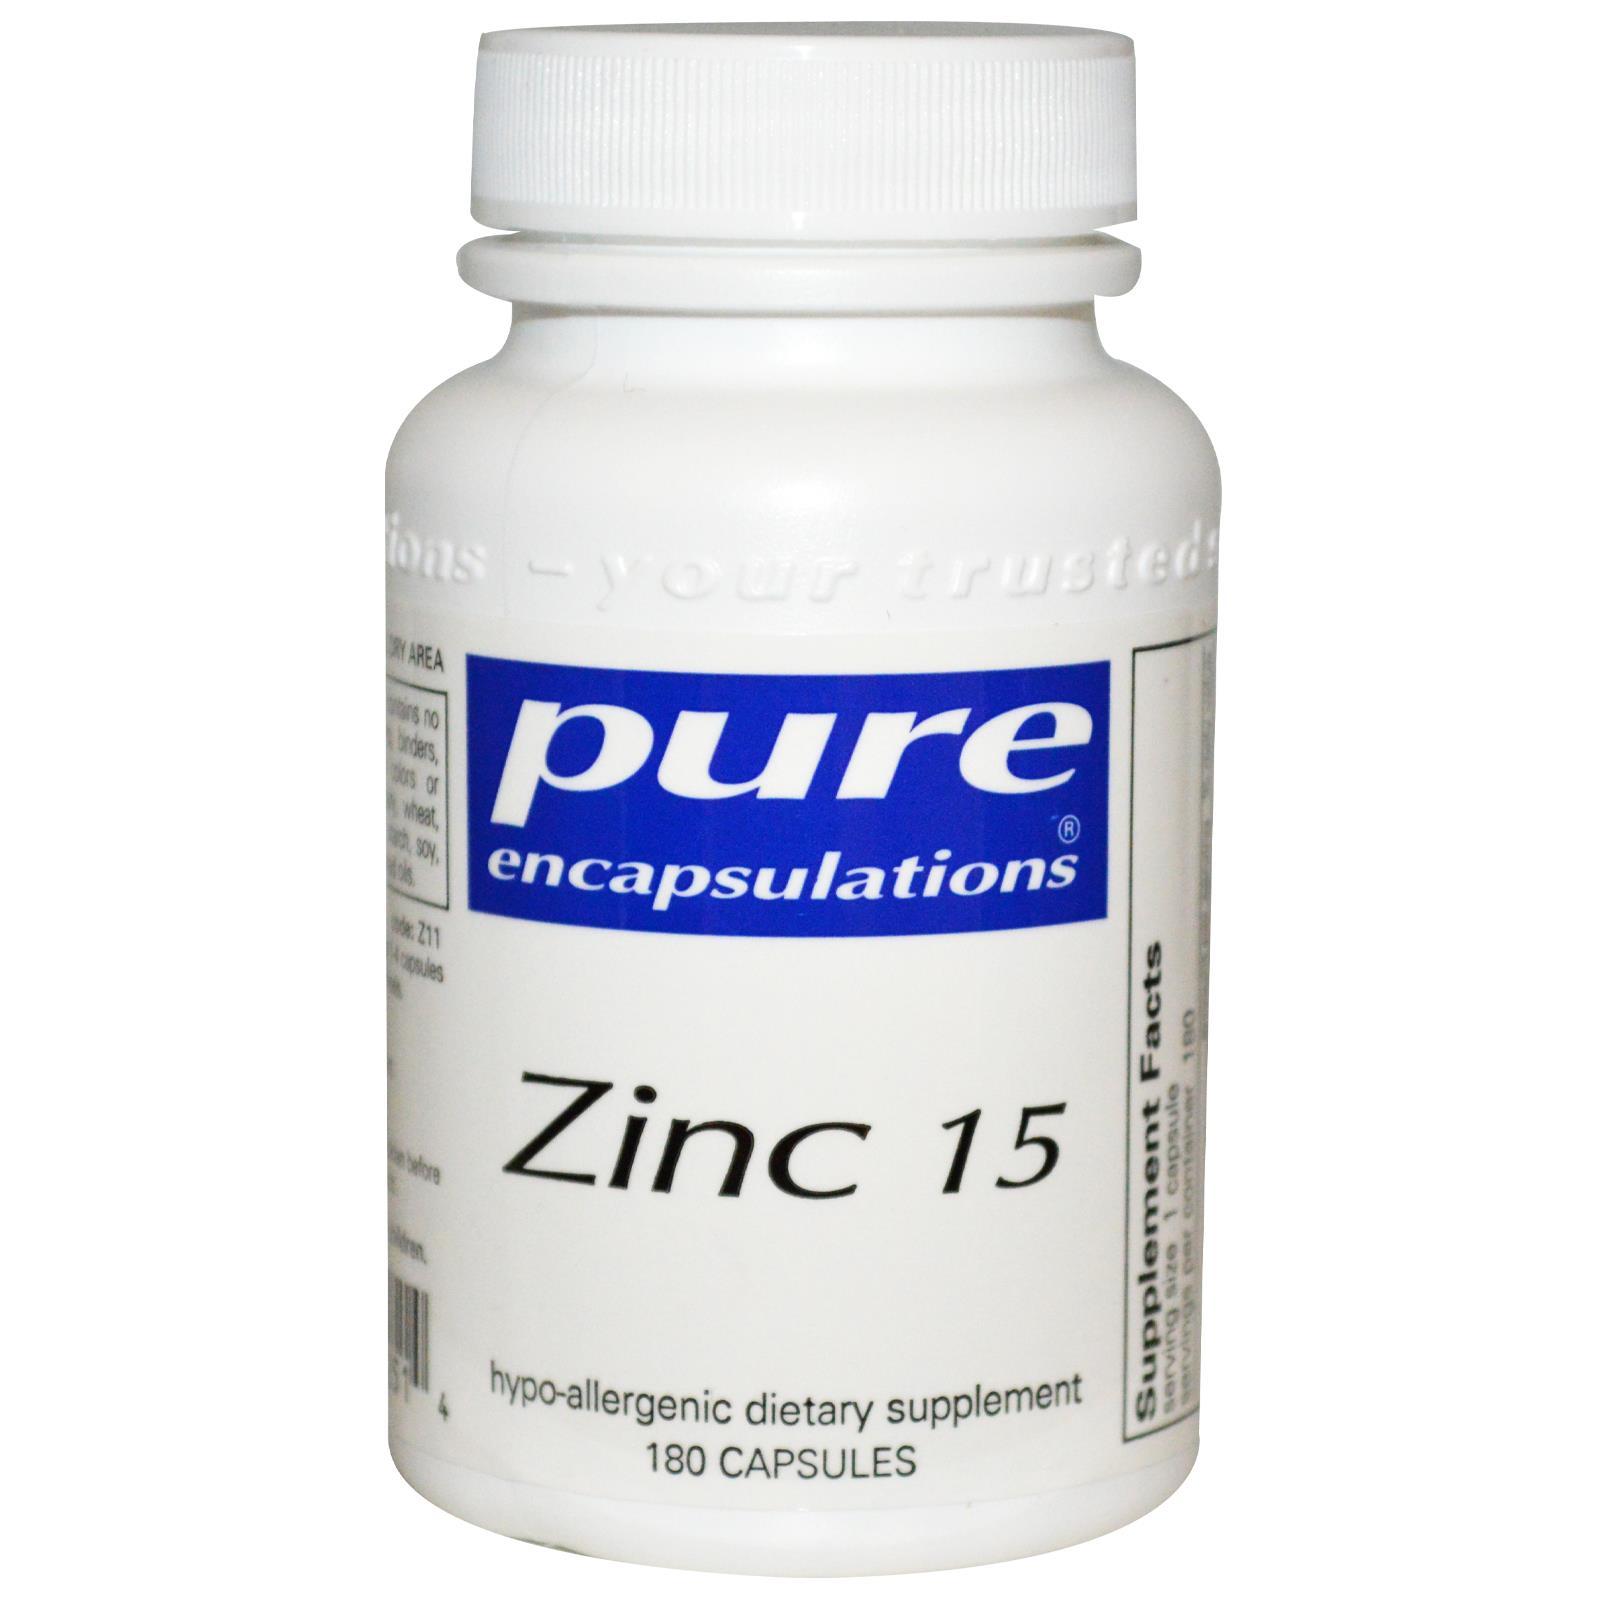 Zinc 15, zinc, supplement, tissue health, tissue repair, vitamin,